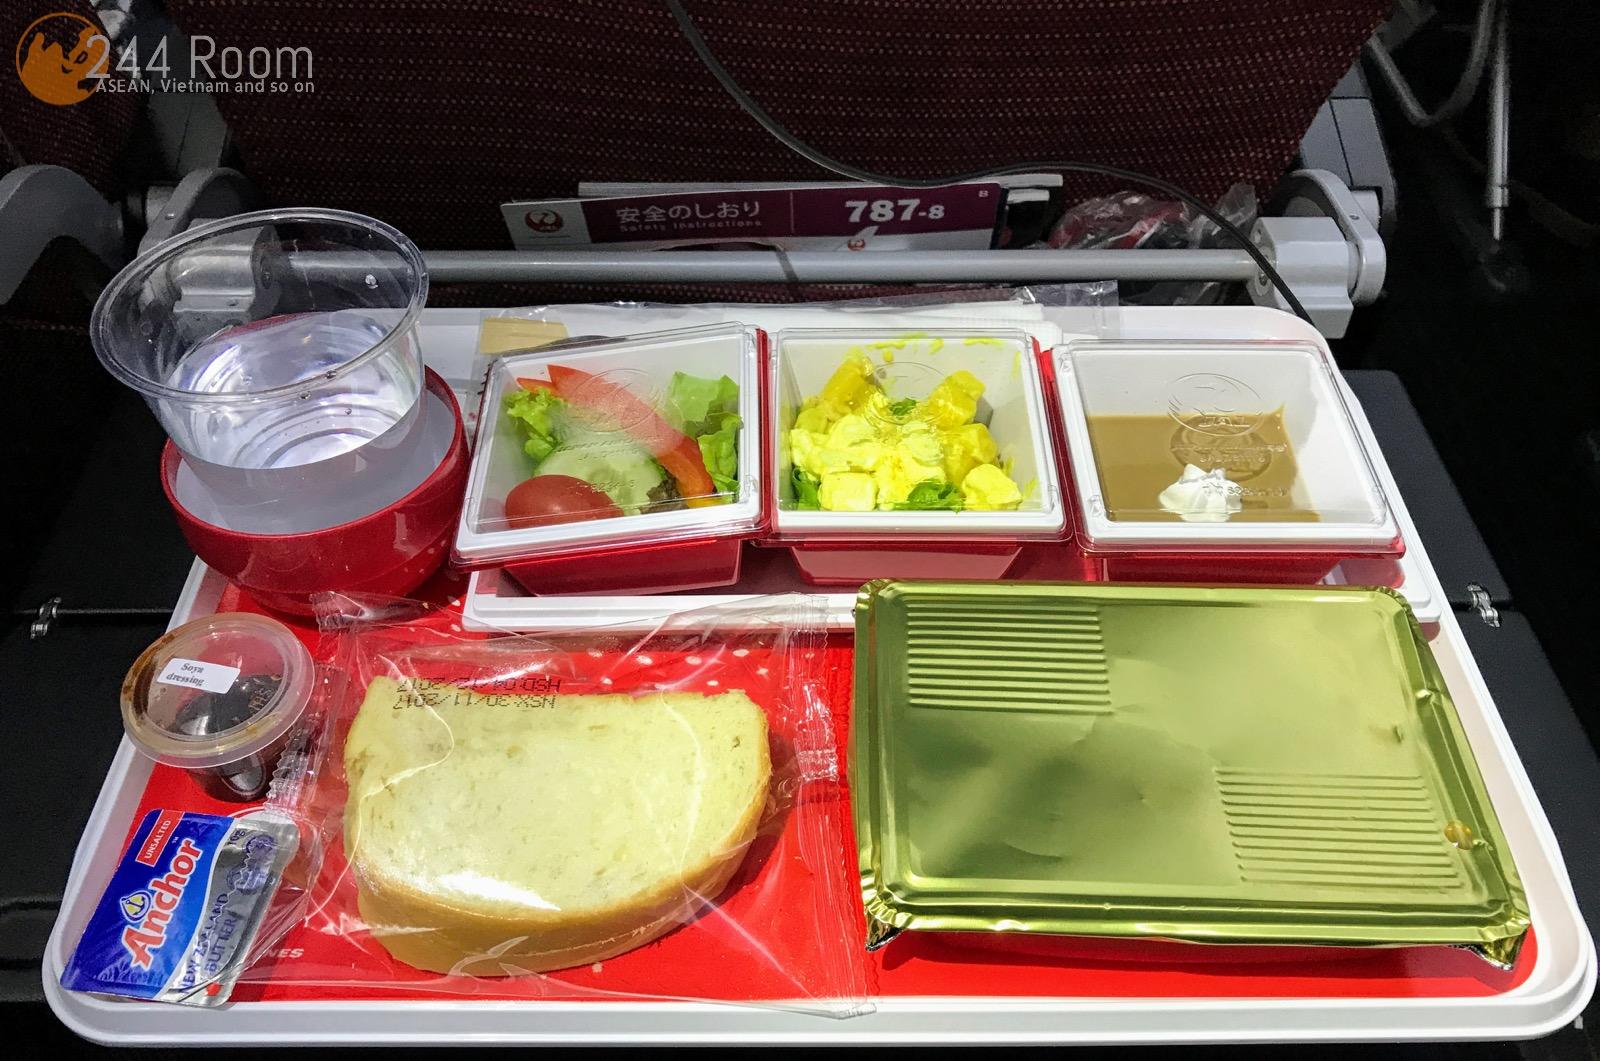 JALエコノミークラス機内食 JAL Economyclass-flight-meal